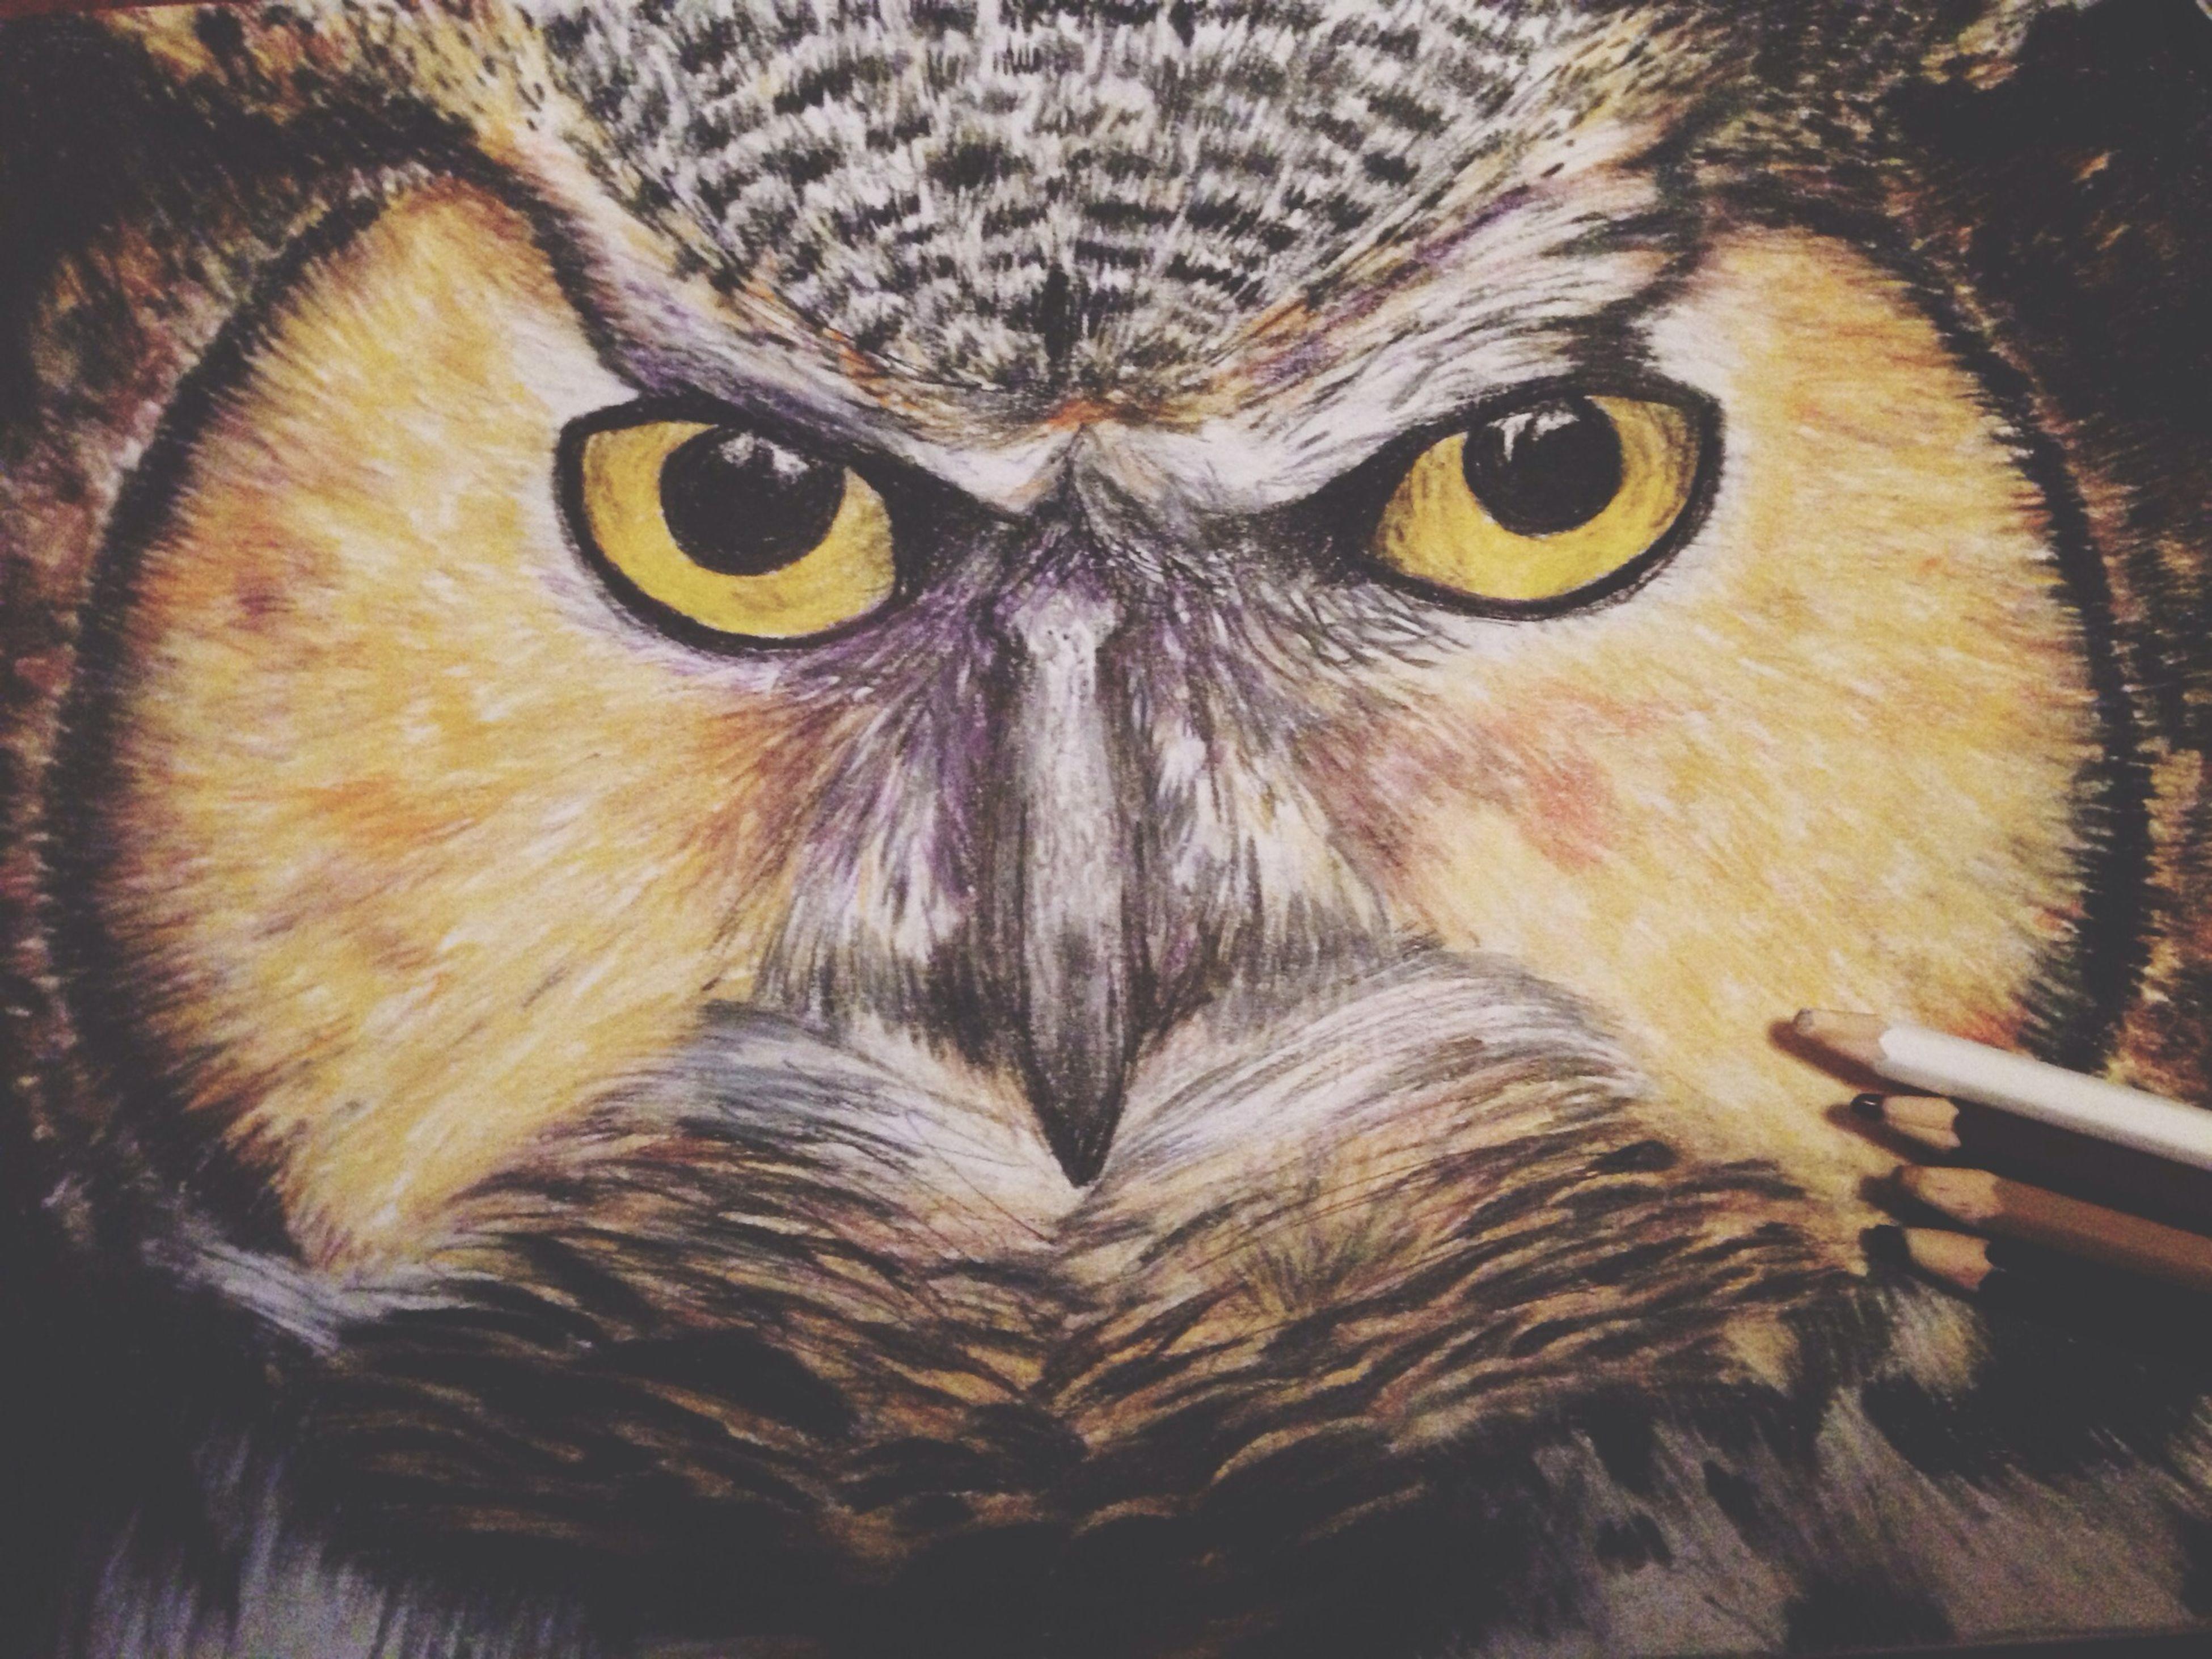 animal themes, one animal, bird, indoors, animal head, animal eye, close-up, portrait, looking at camera, cat, domestic cat, animal body part, pets, feline, whisker, domestic animals, wildlife, animals in the wild, no people, zoology